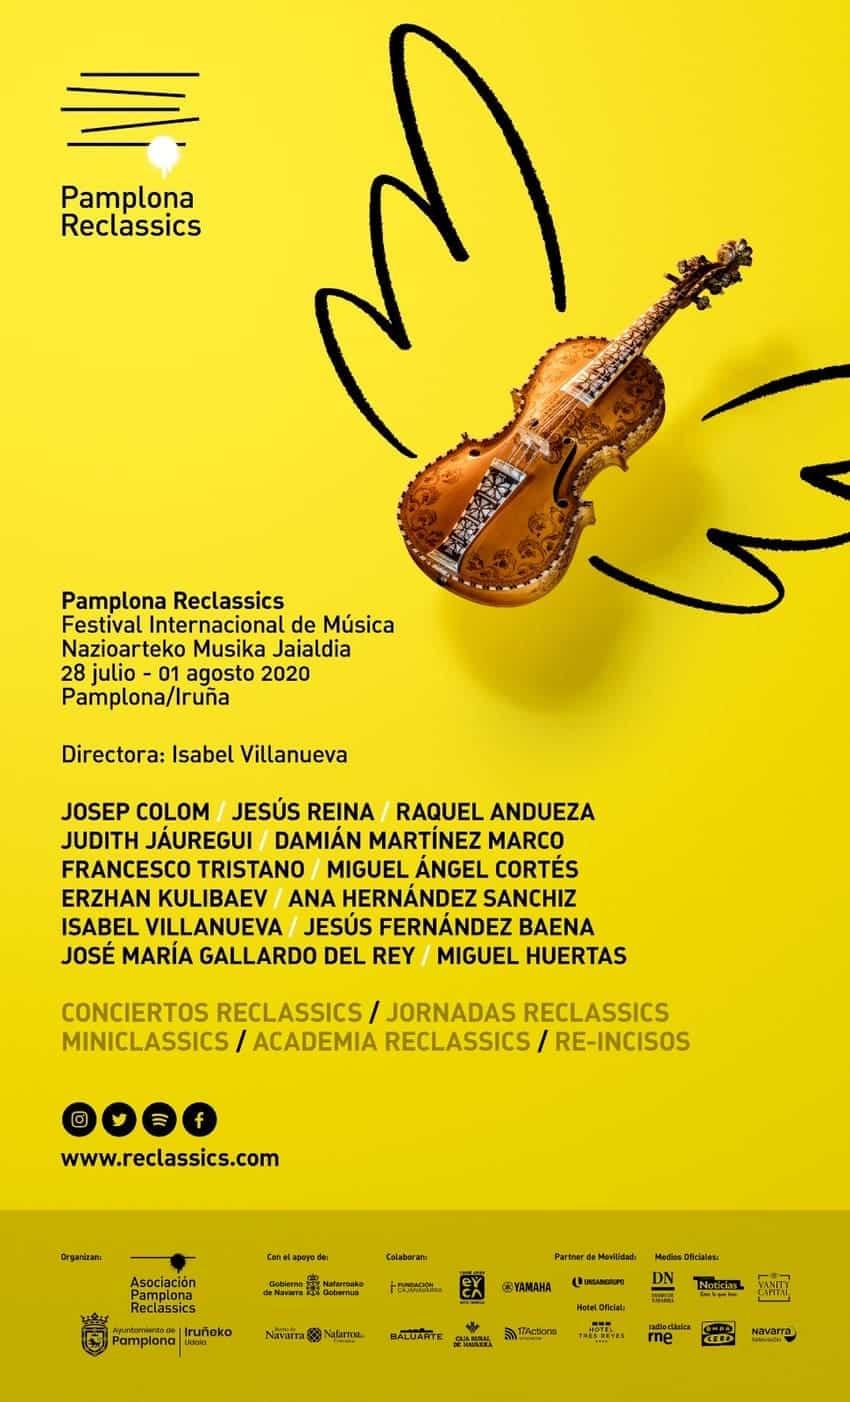 Pamplona Reclassics